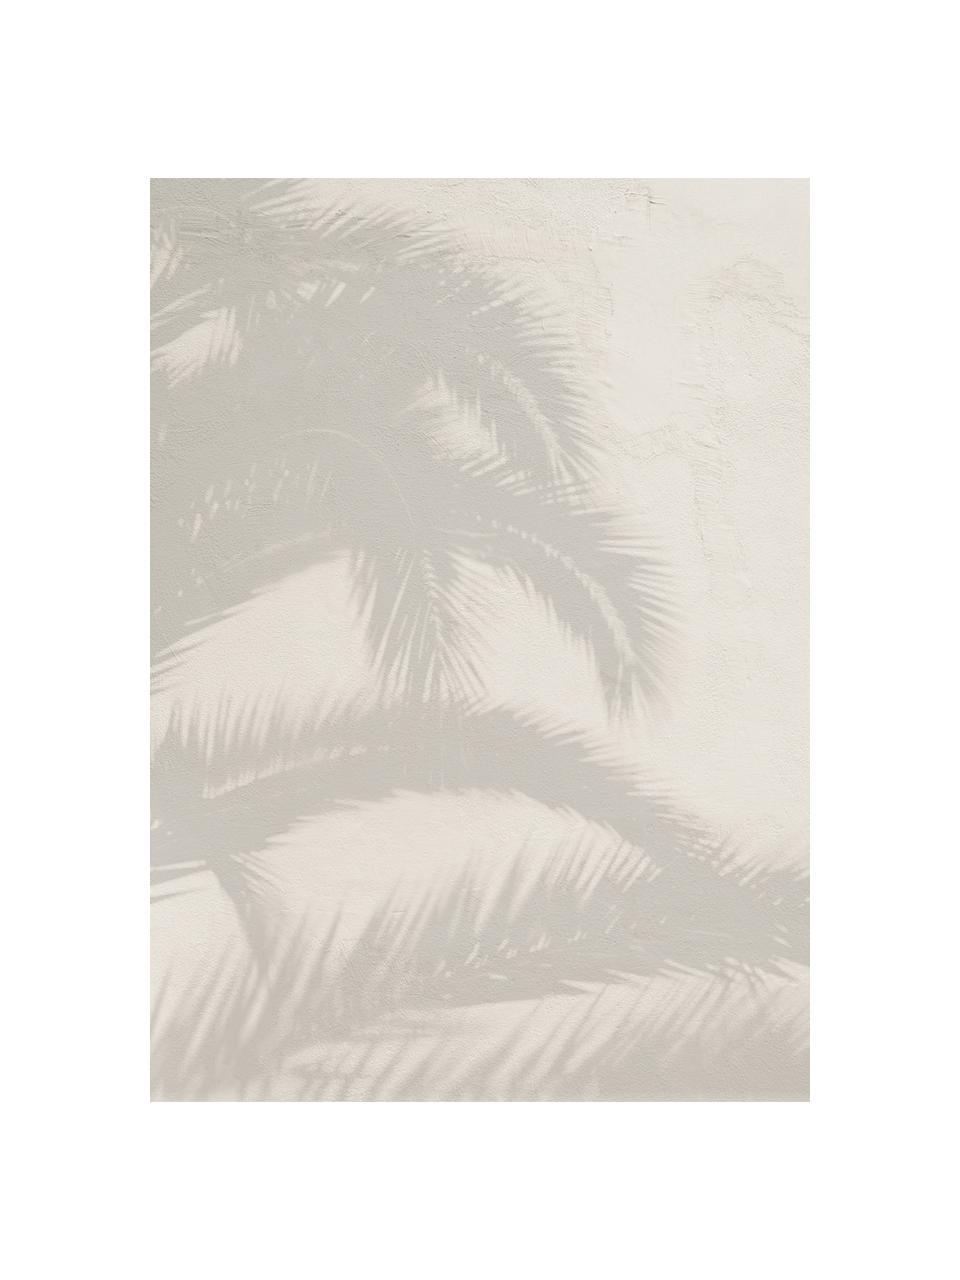 Carta da parati  Shadow, Tessuto non tessuto, Grigio chiaro, beige, Larg. 200 x Alt. 280 cm